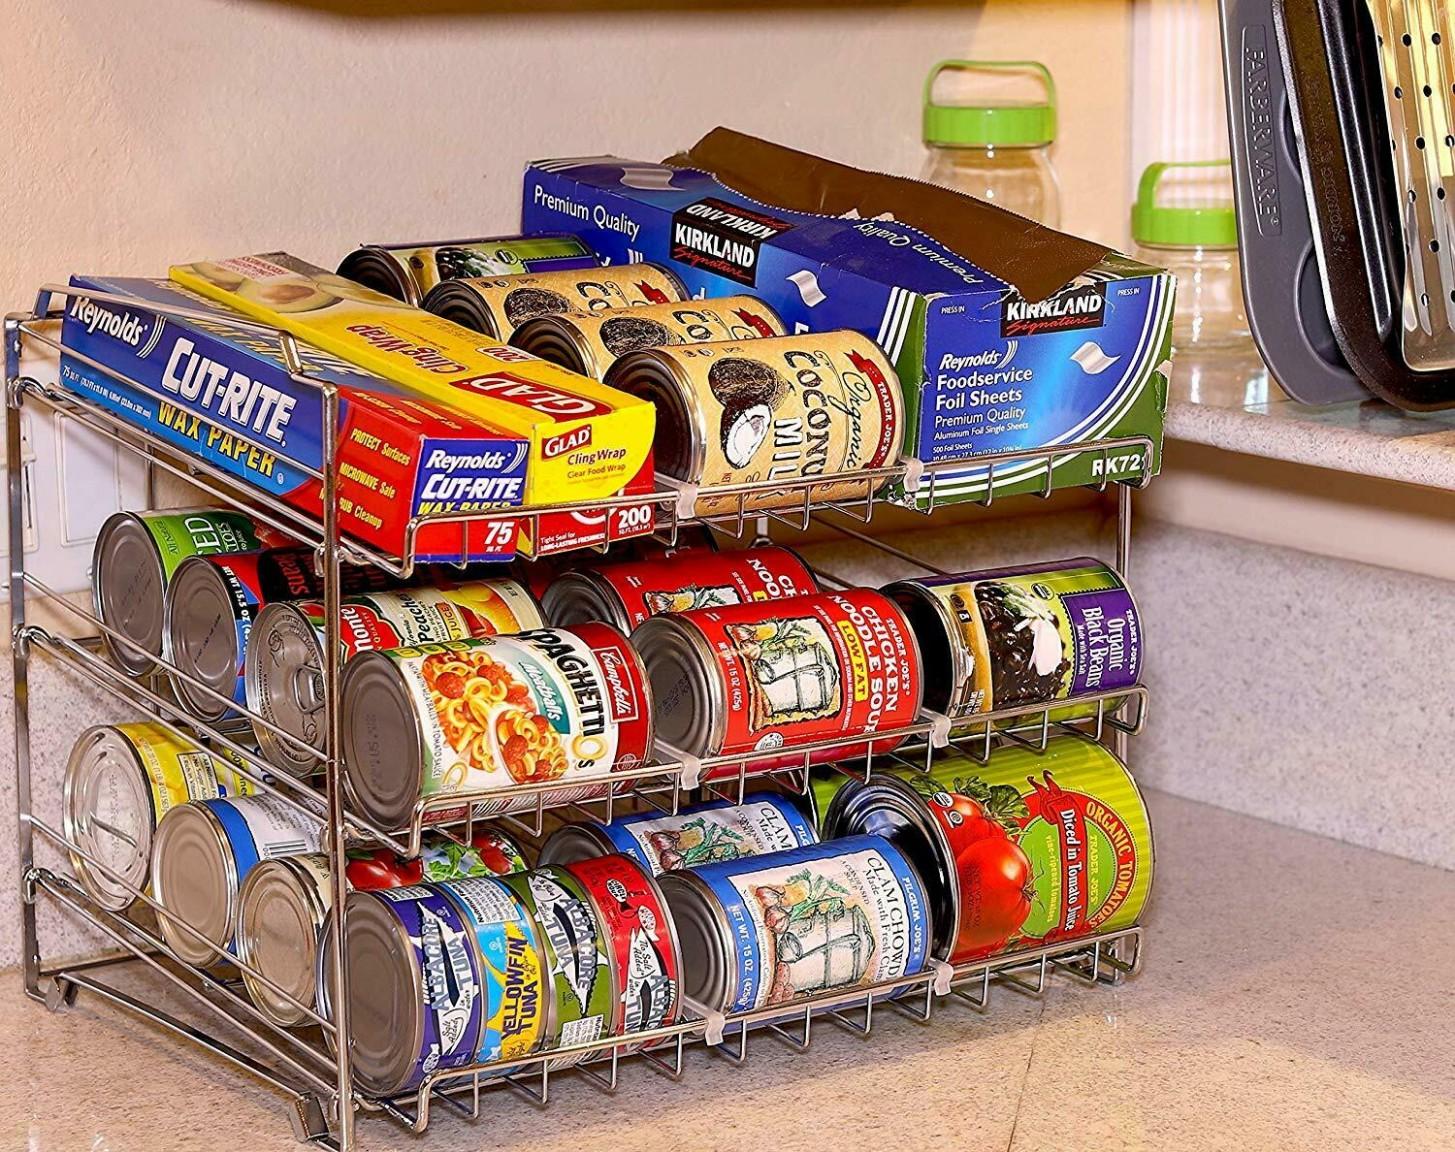 NEW 9 Tier Chrome Finish Metal Kitchen Pantry Cabinet Can Goods / Jar  Organizer - Org Metal Mesh Kitchen Cabinet Organizer